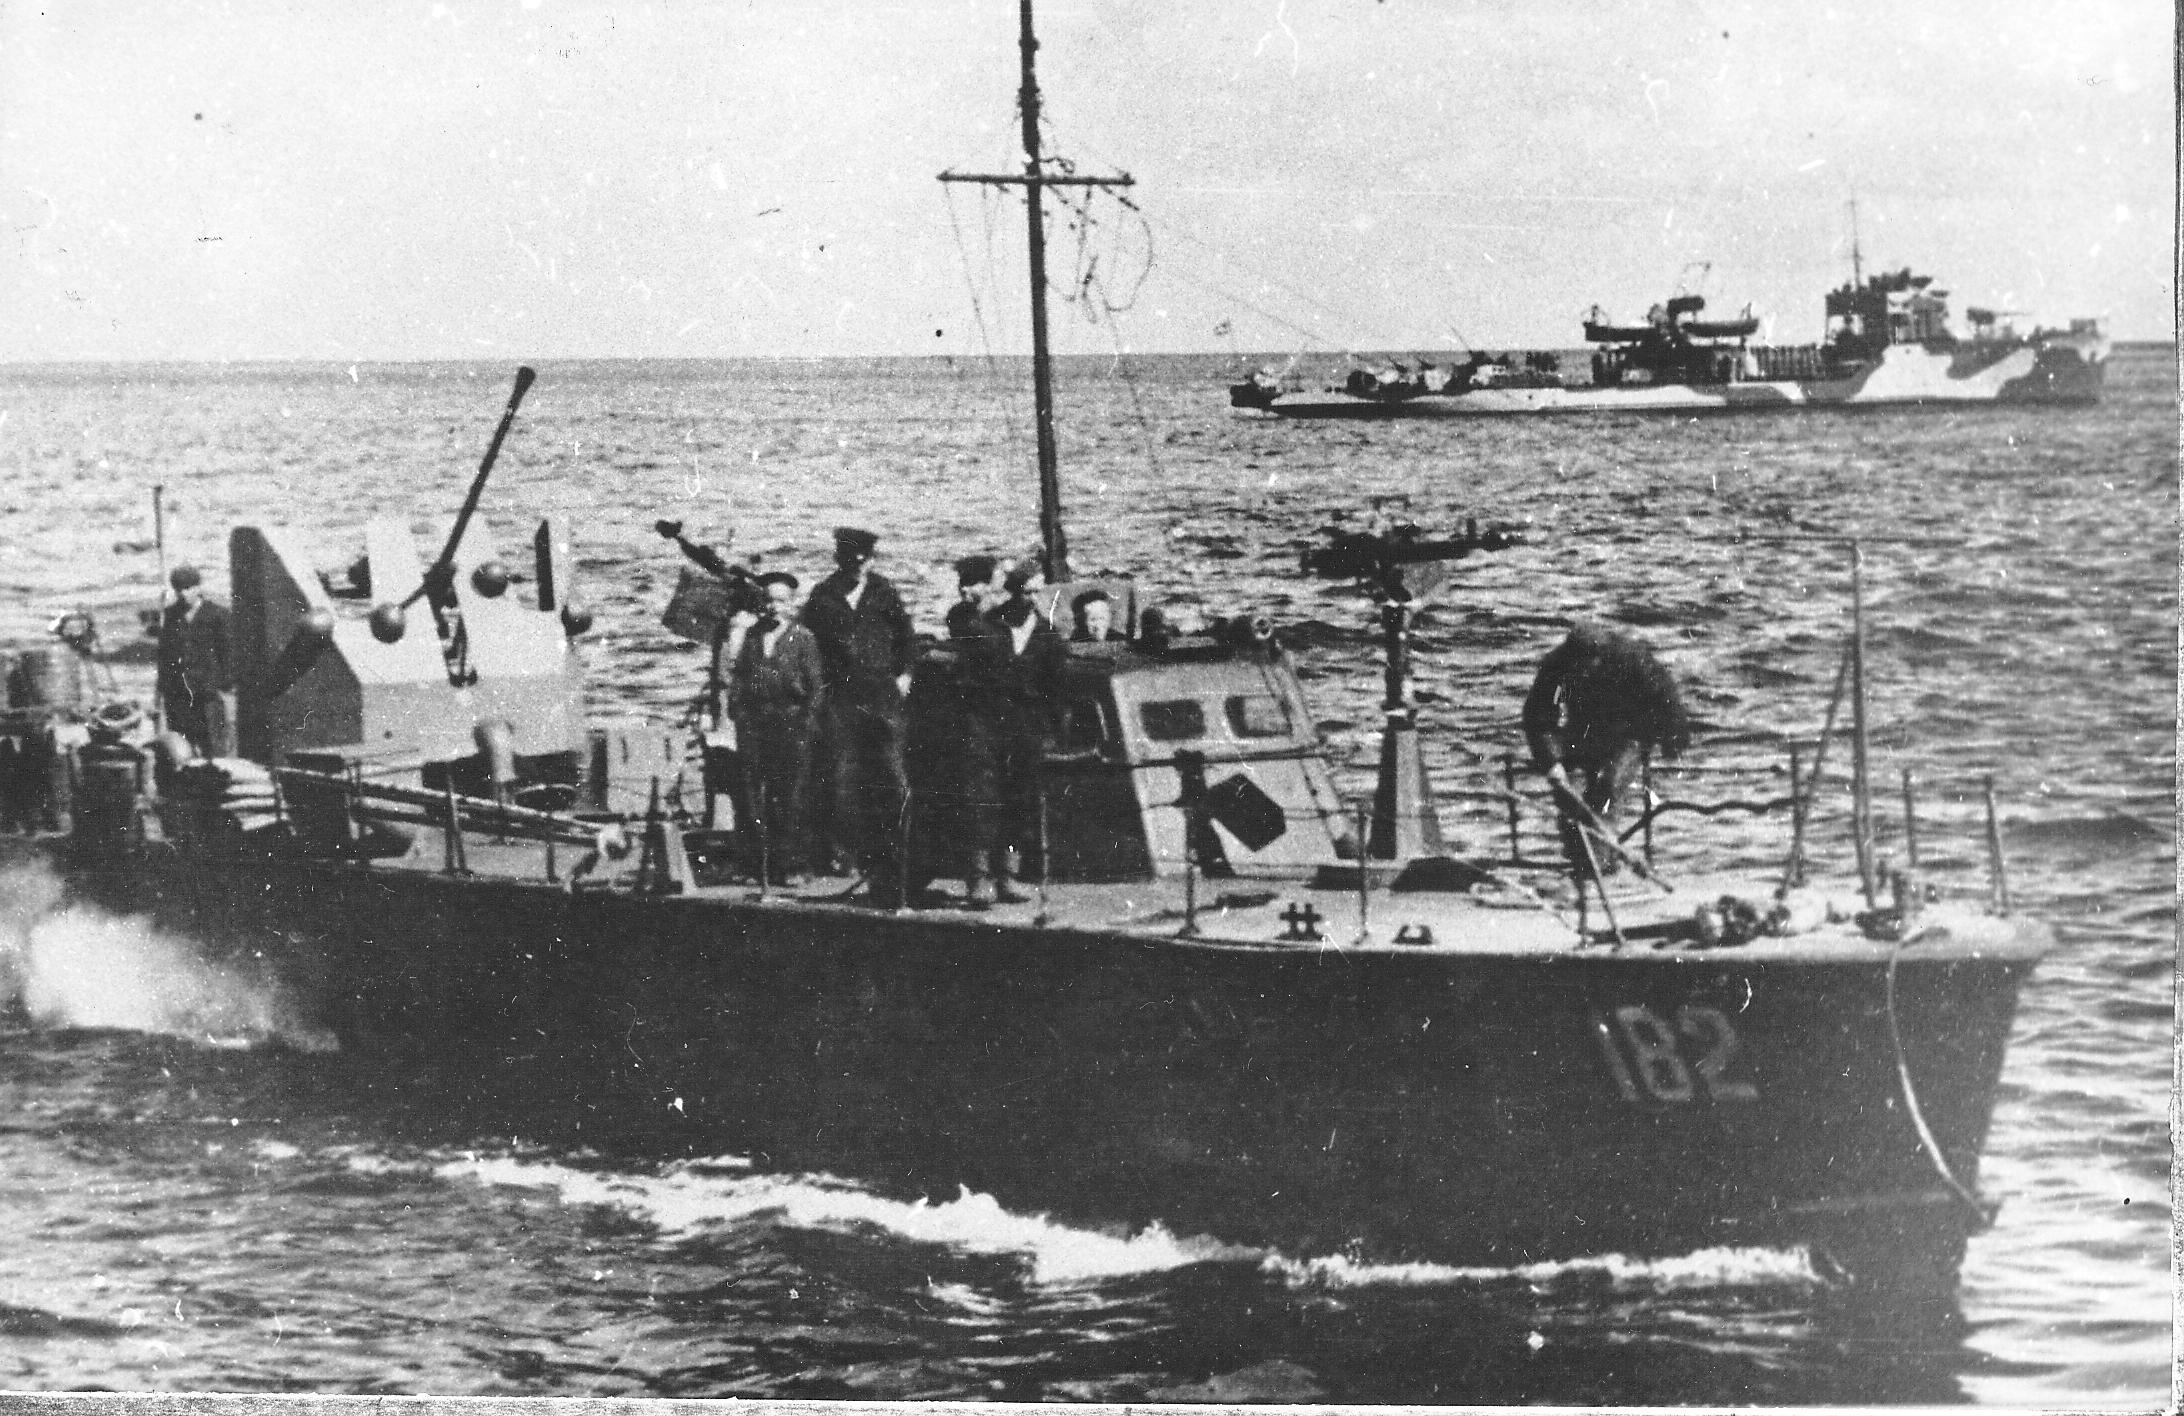 ска-182 ех.тк-82 -бф после марта 43.jpg